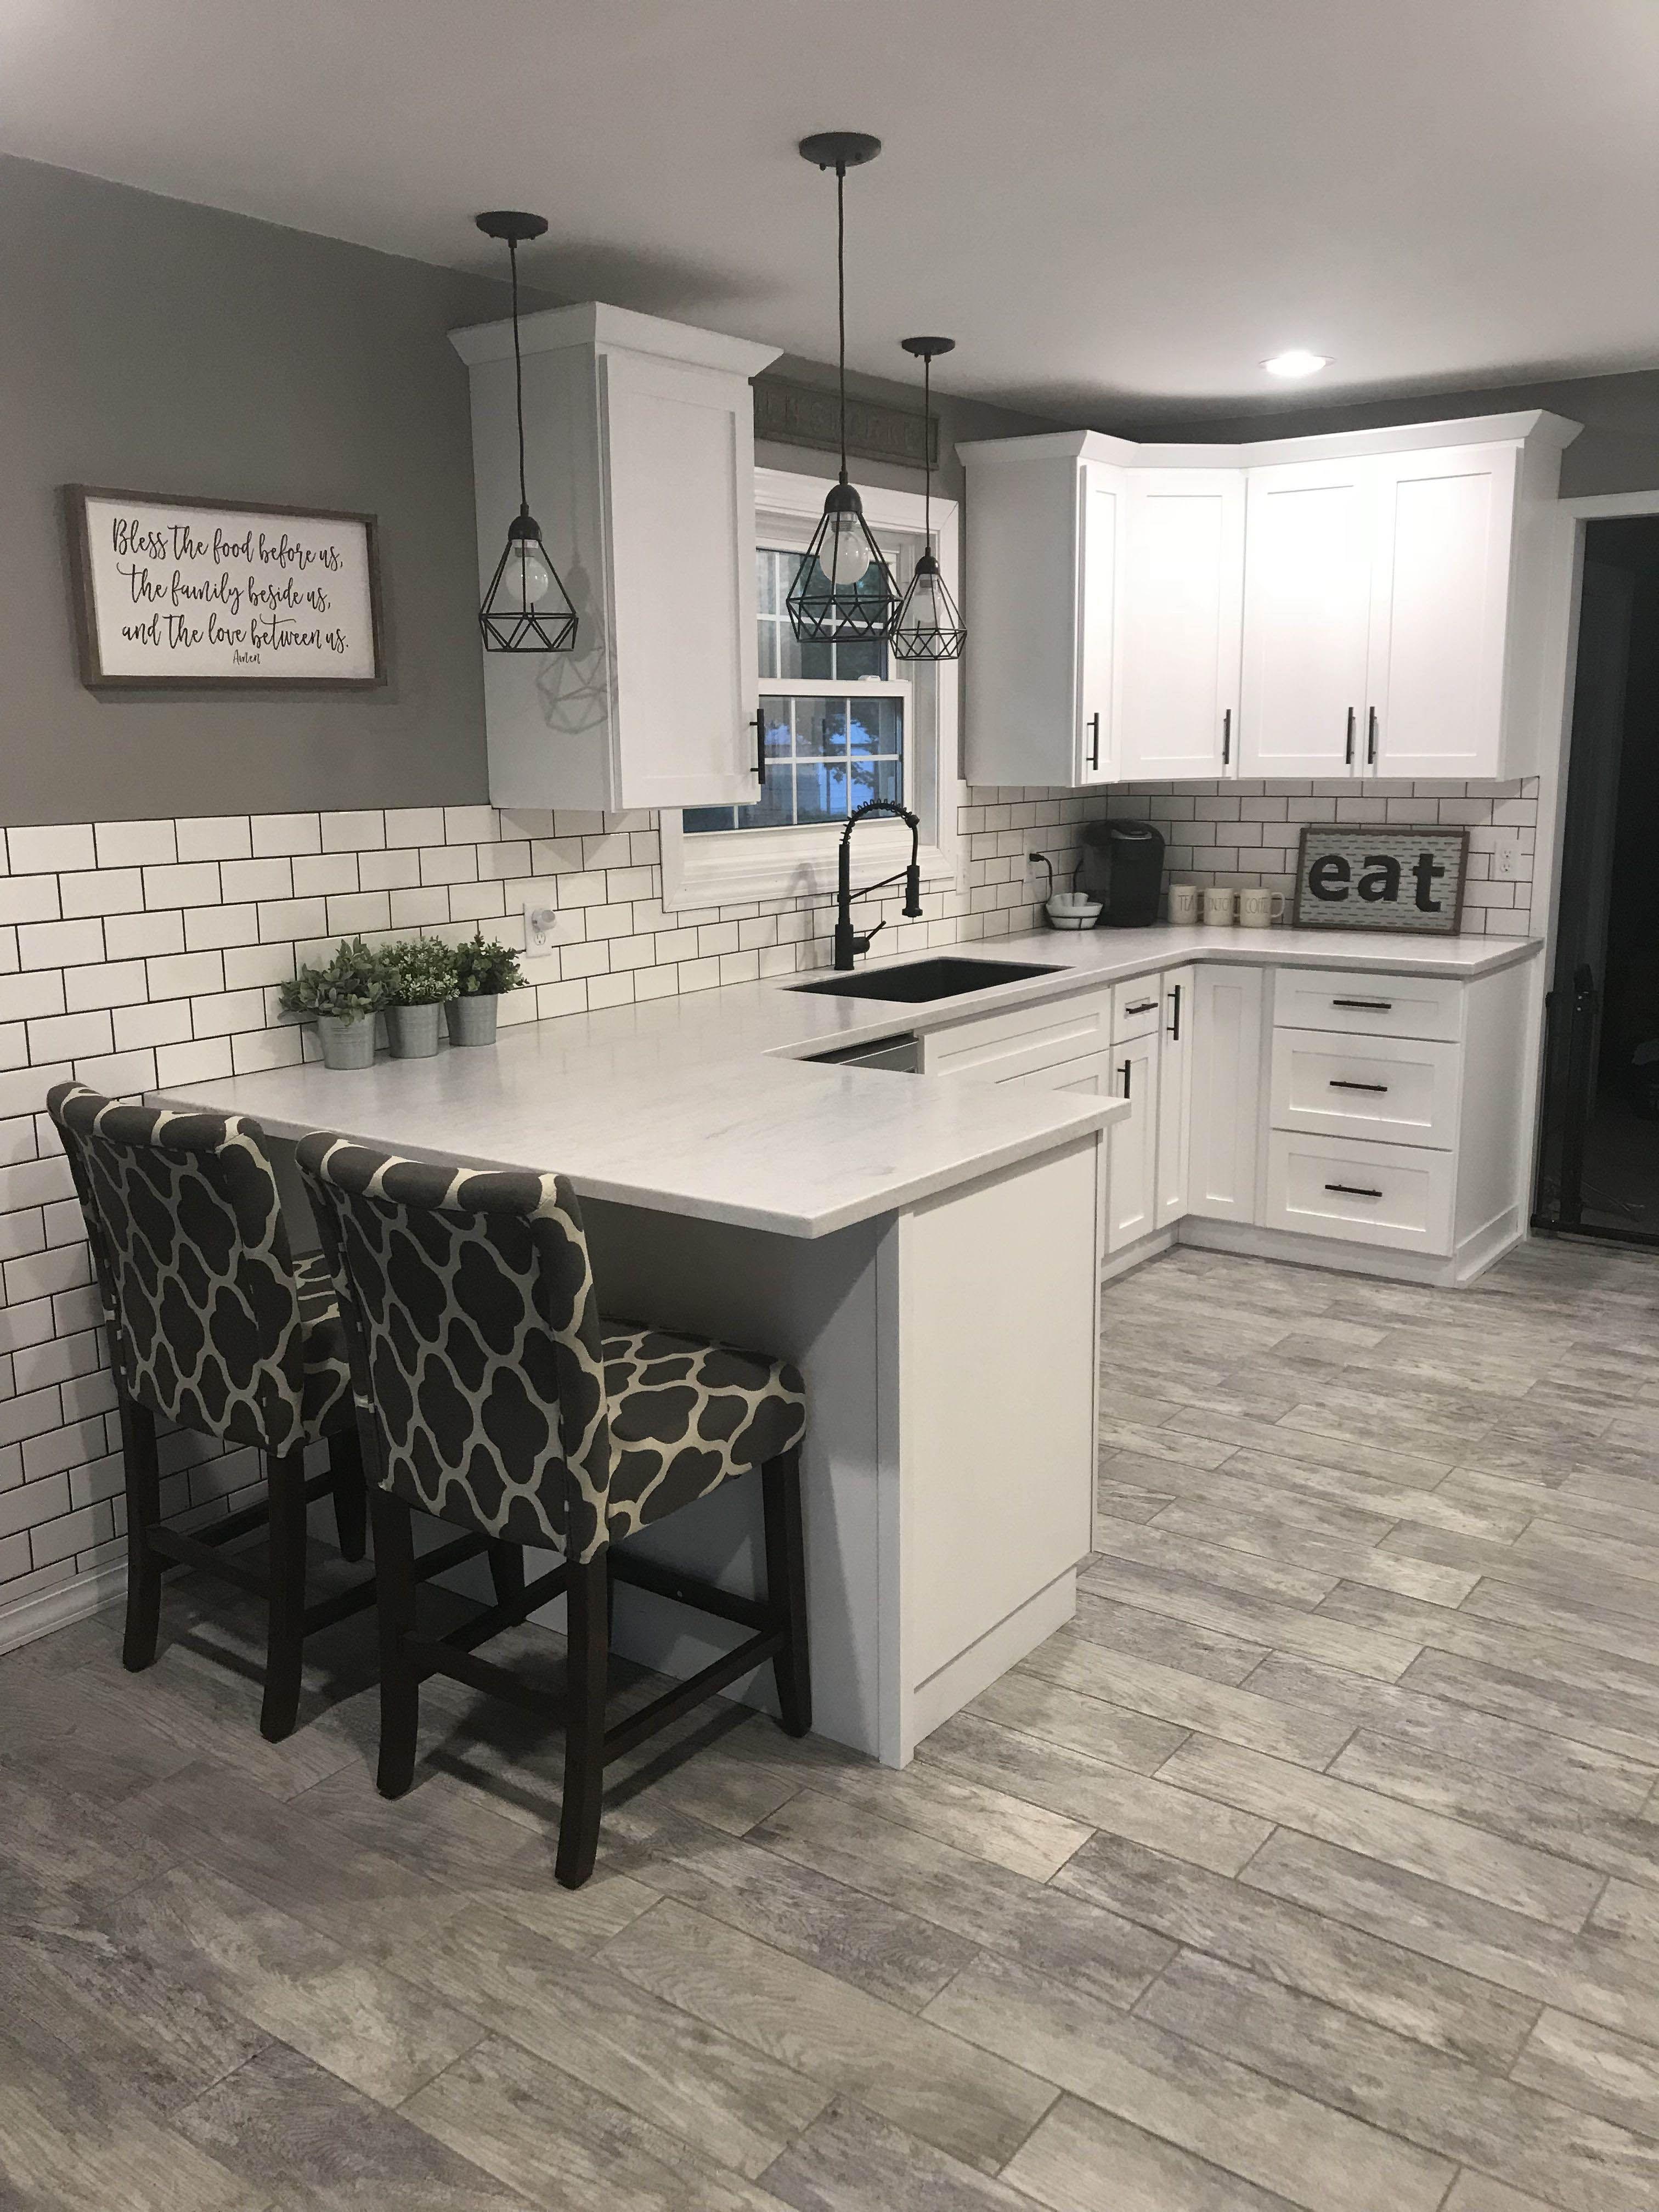 Ways To Style Gray Kitchen Cabinets Kitchen Remodel Small Diy Kitchen Remodel Country Kitchen Farmhouse